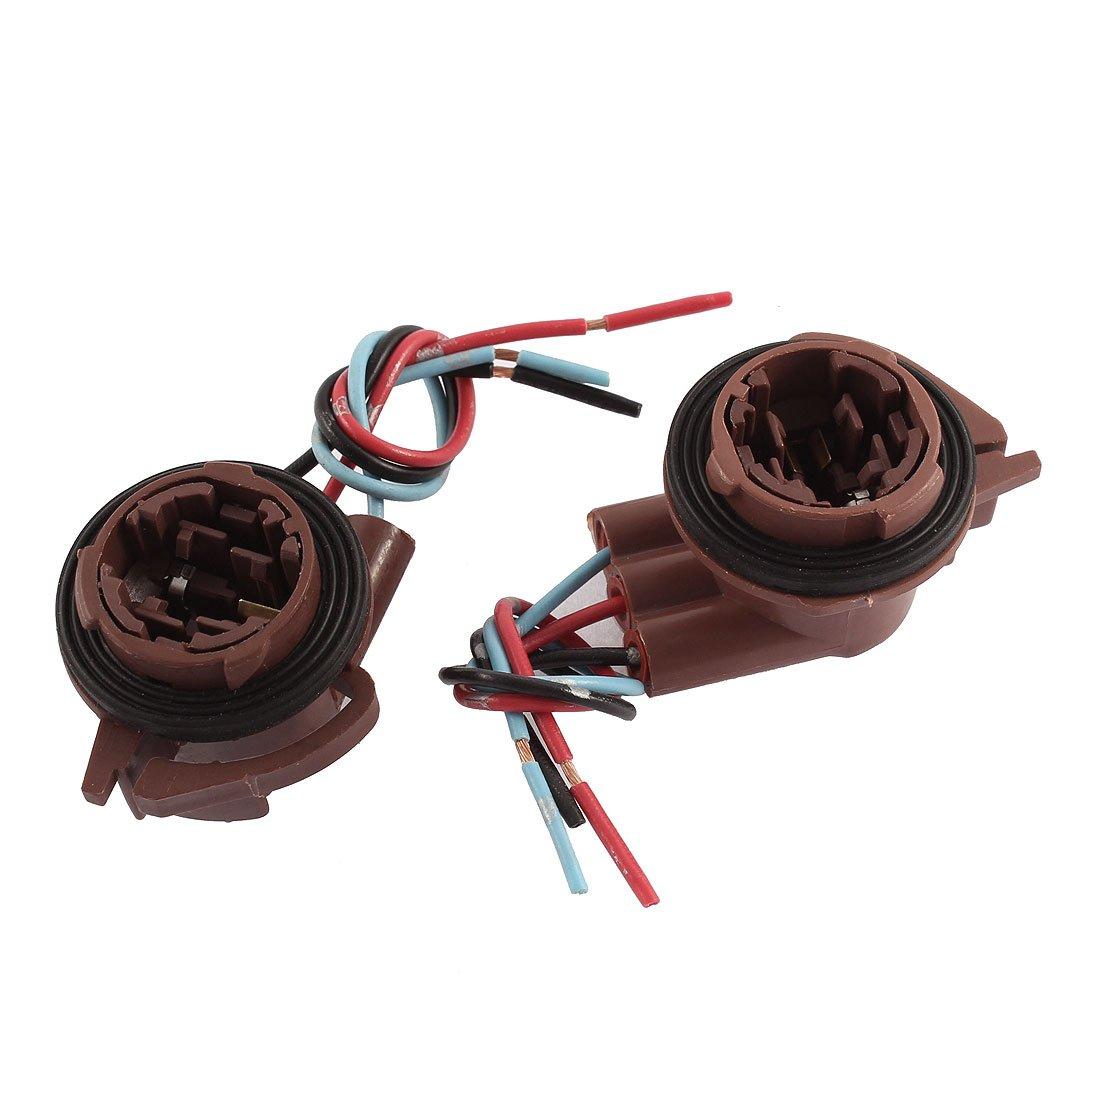 61xM4GVGjfL._SL1100_ amazon com uxcell 2pcs car 3157 light socket harness wire  at alyssarenee.co